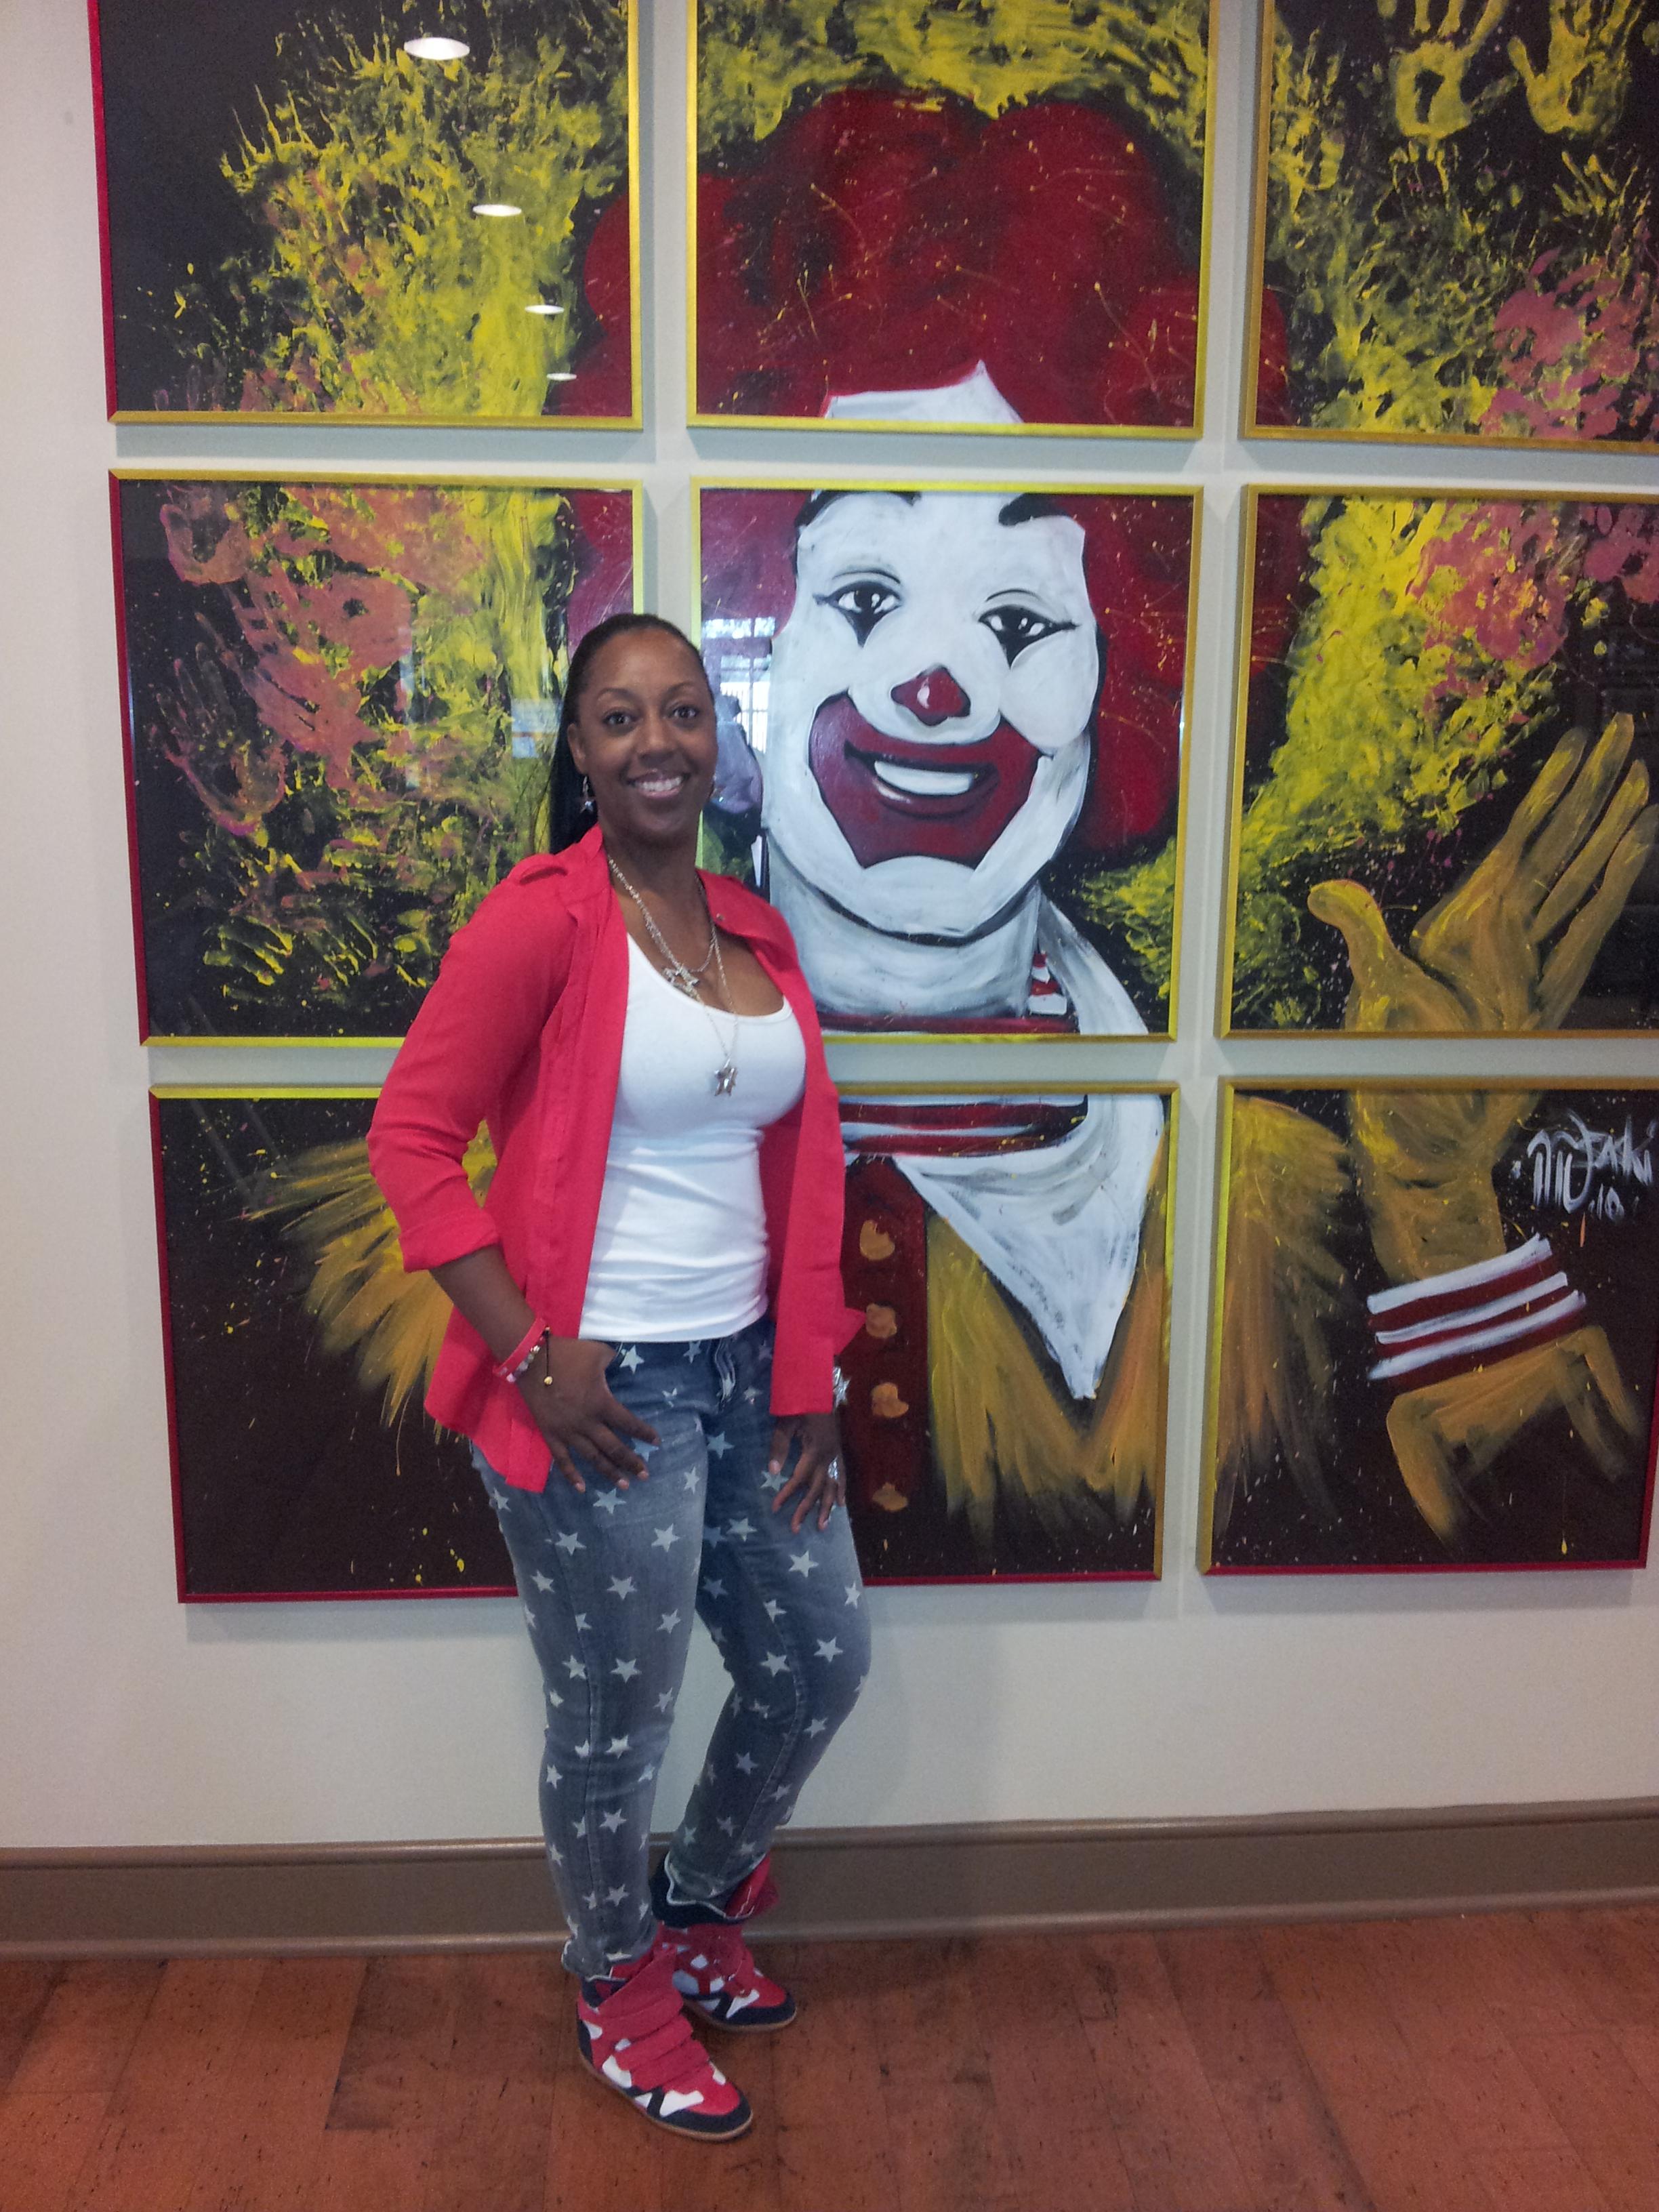 Tammie and Ronald McDonald Artpiece